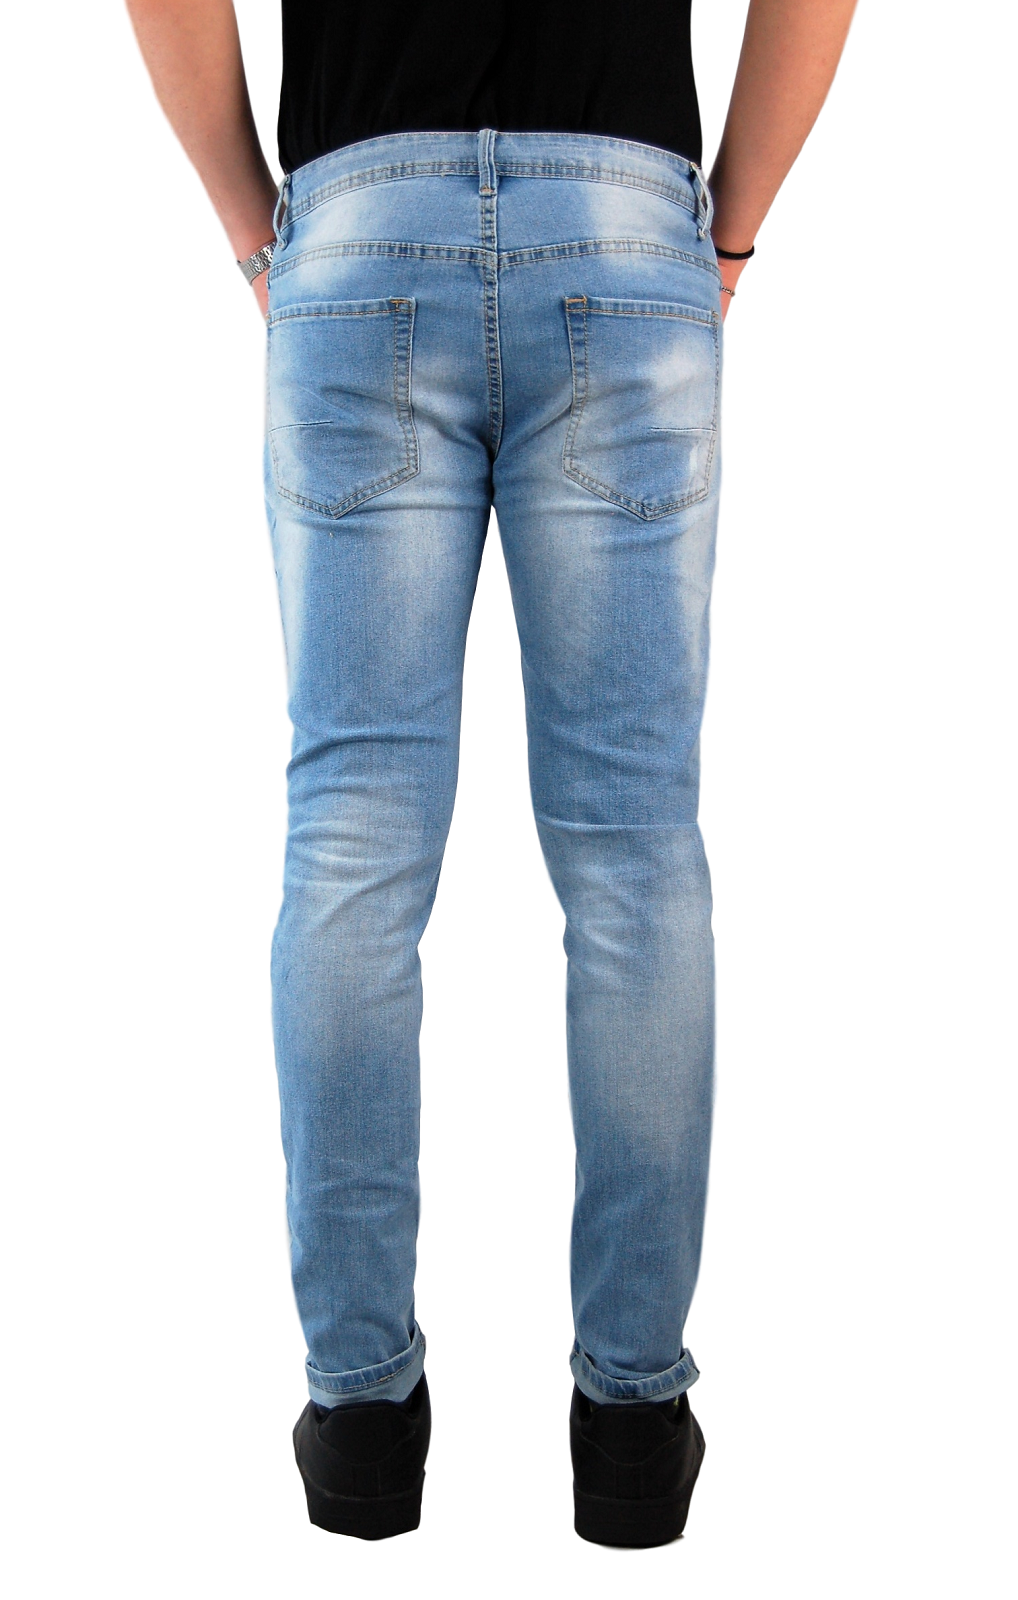 Jeans-Uomo-Slim-fit-Strappati-Pantaloni-Elasticizzati-Casual-Denim-Blu miniatura 14